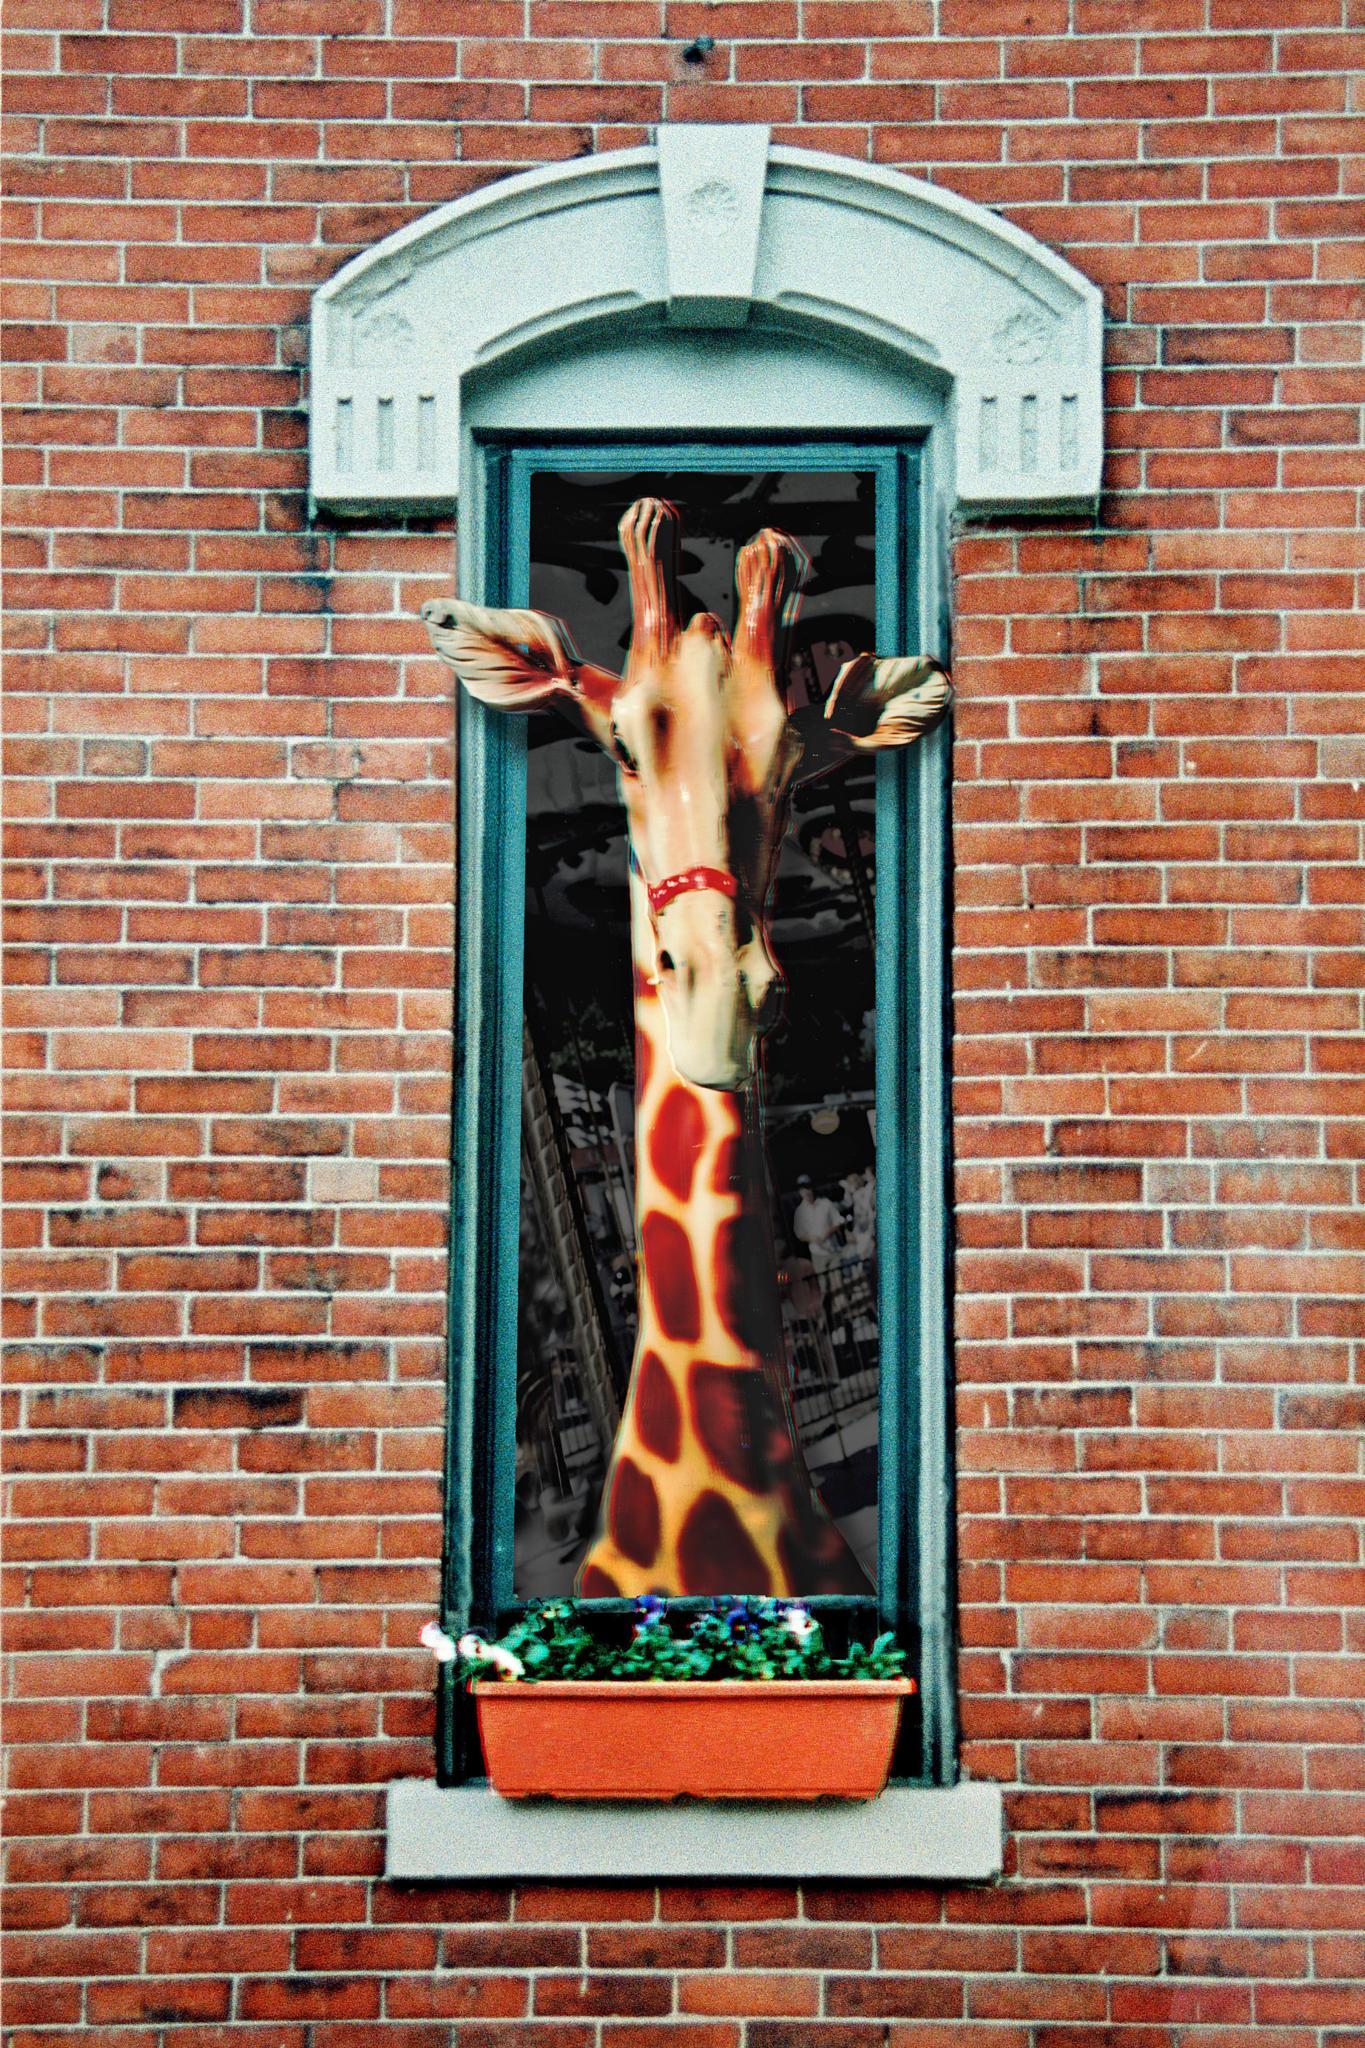 """The Neighbor's Giraffe"" by davidlstickney"